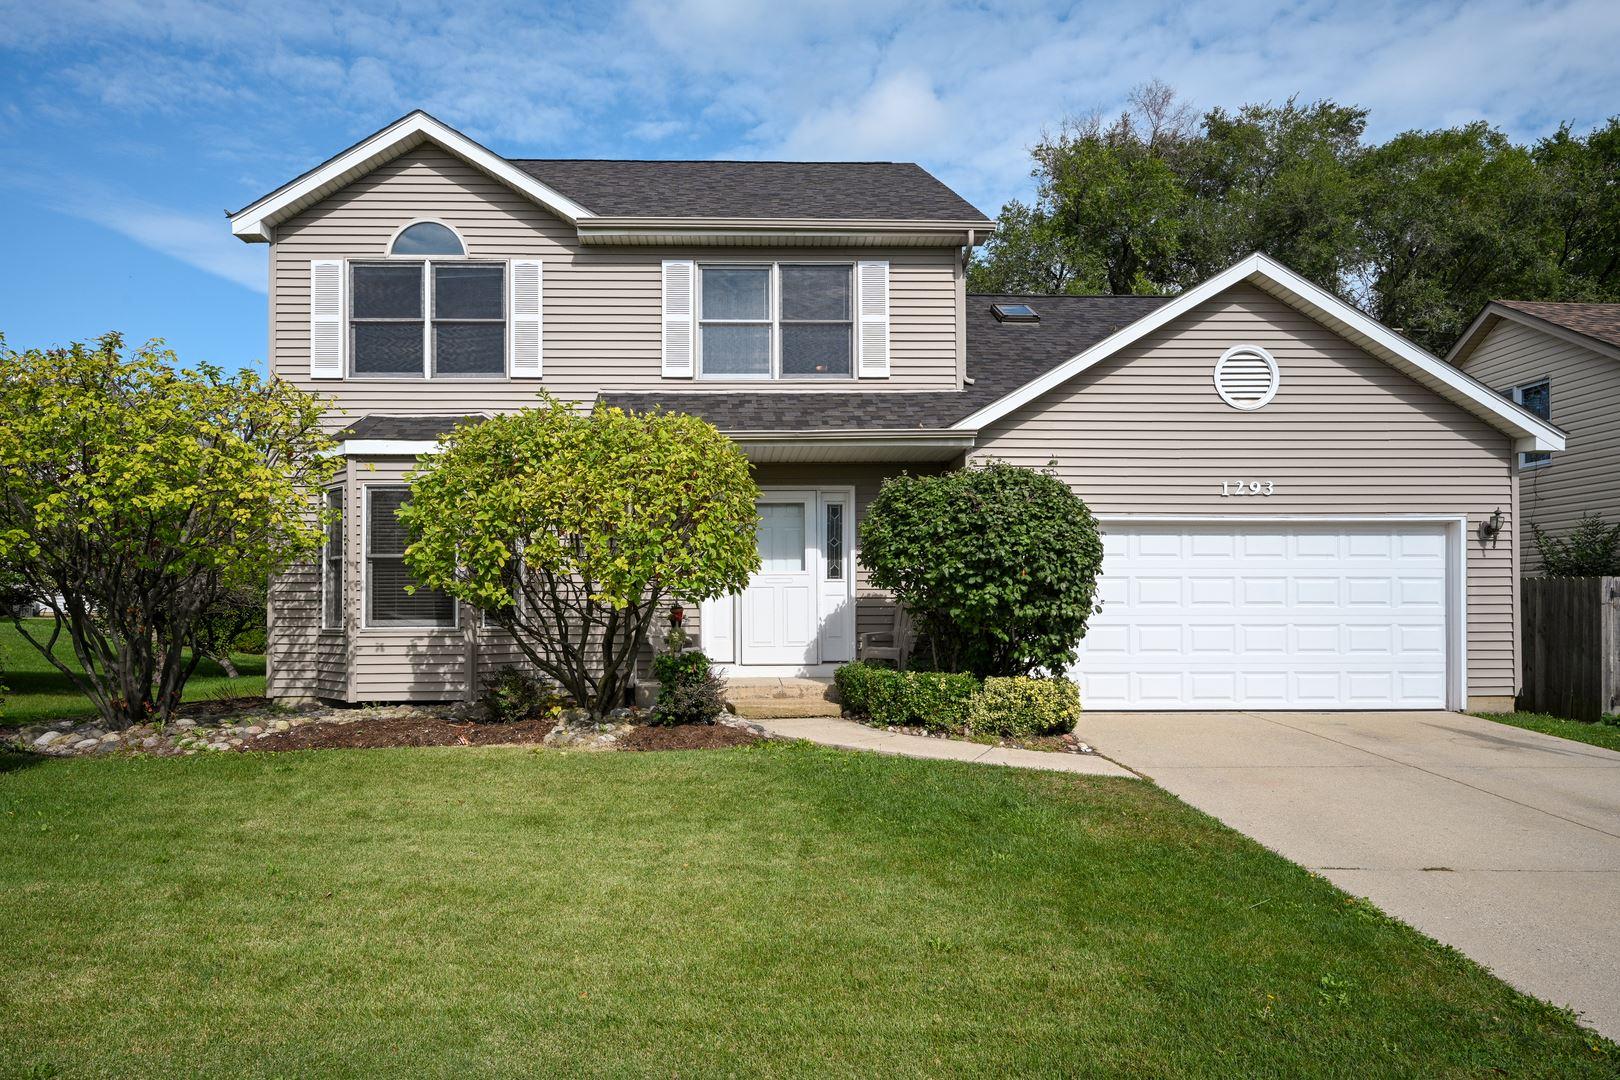 1293 Roberta Court, Glendale Heights, IL 60139 - #: 11246104